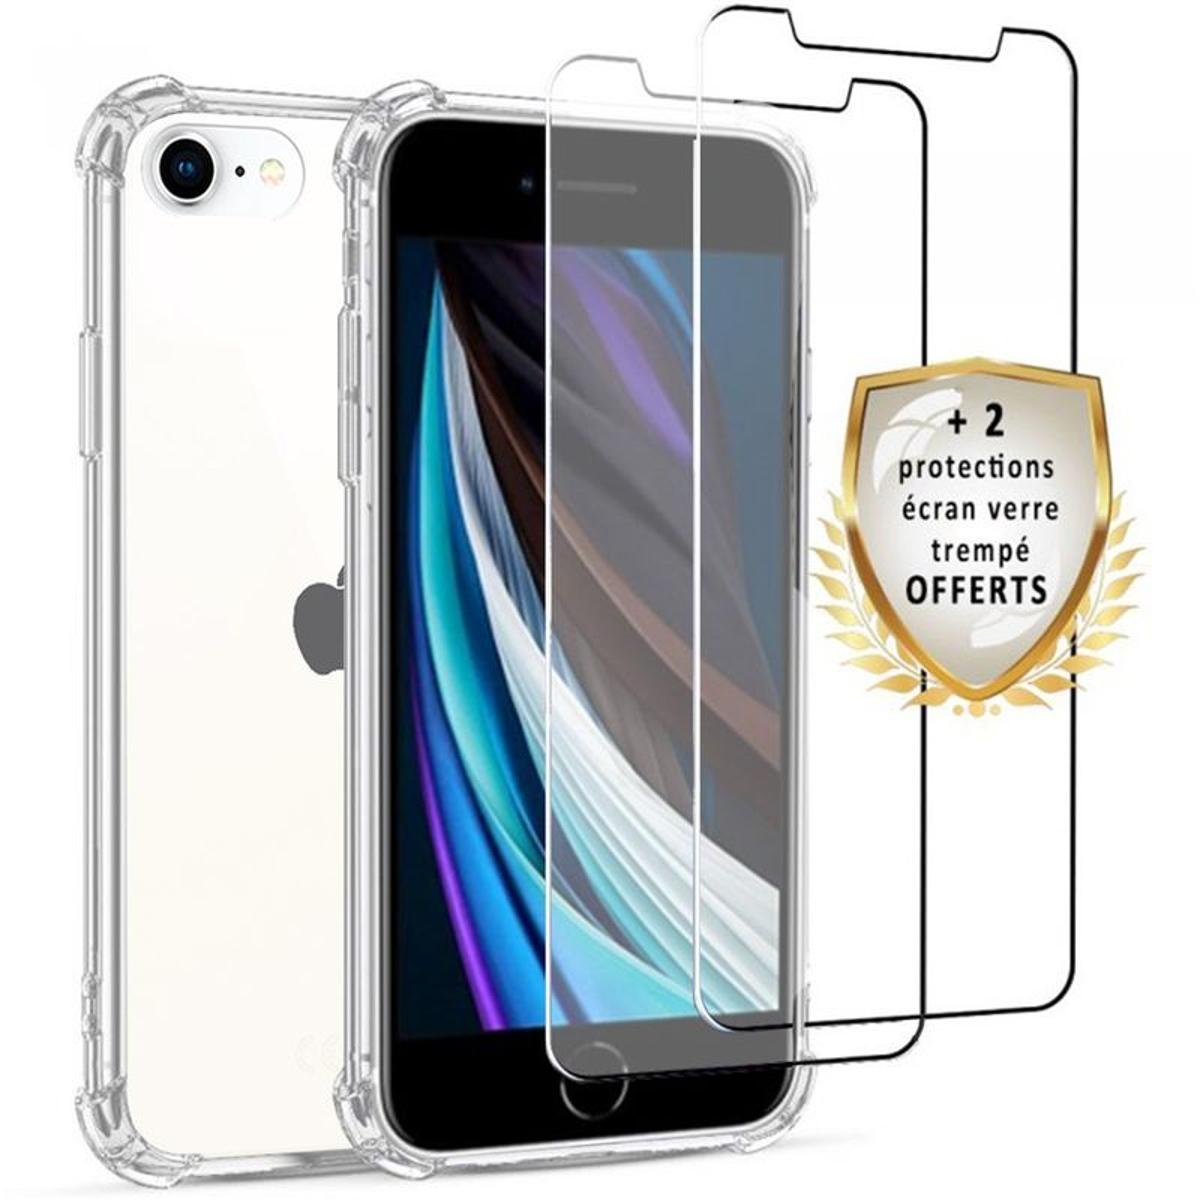 Coque iPhone SE silicone